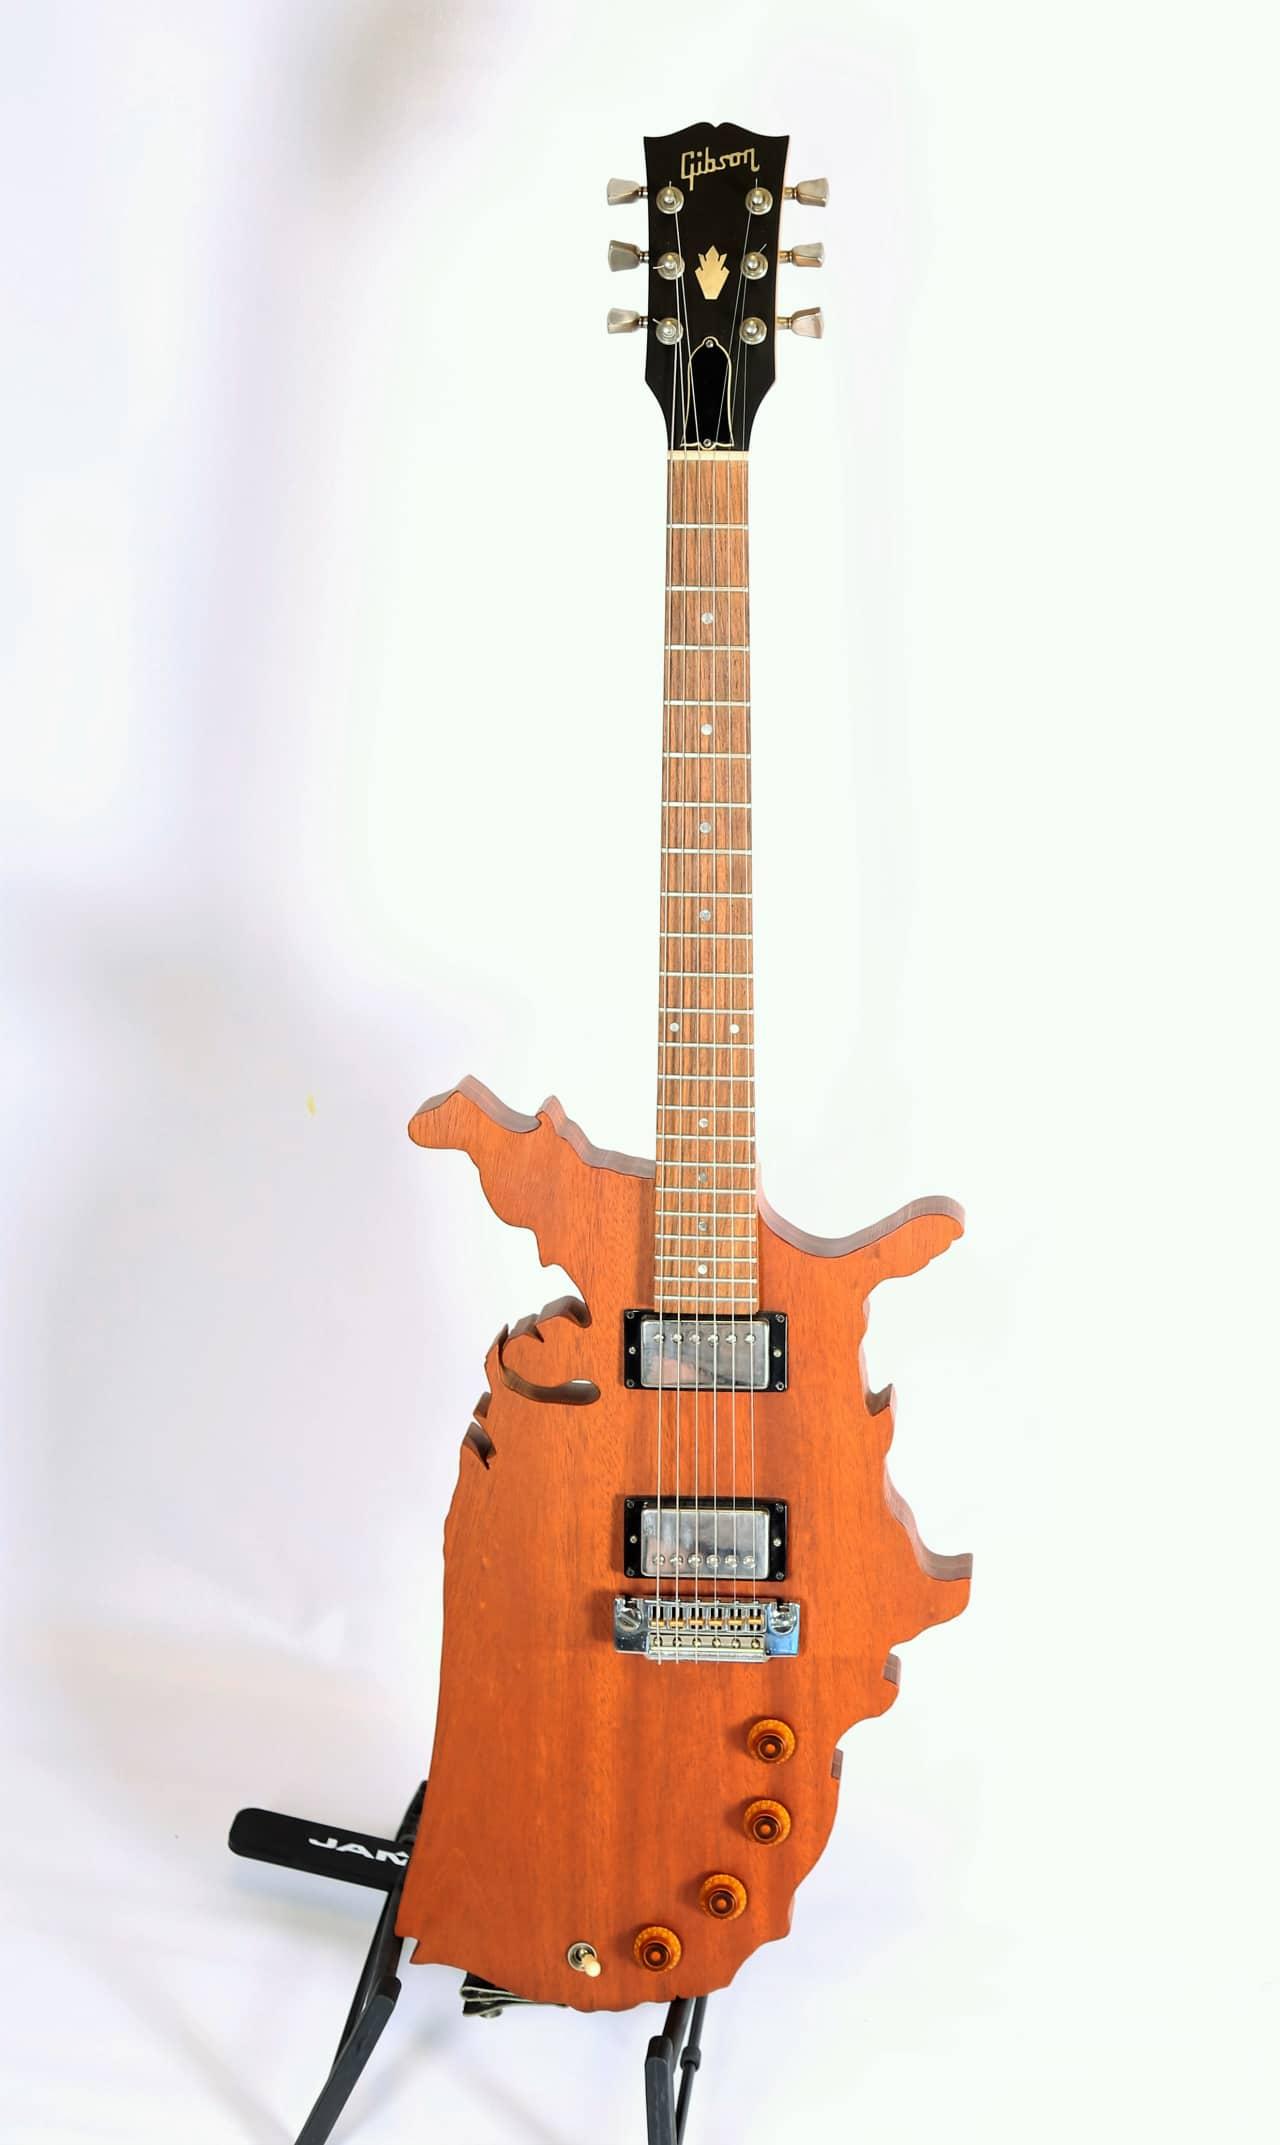 1983 gibson usa map electric guitar natural rare reverb. Black Bedroom Furniture Sets. Home Design Ideas